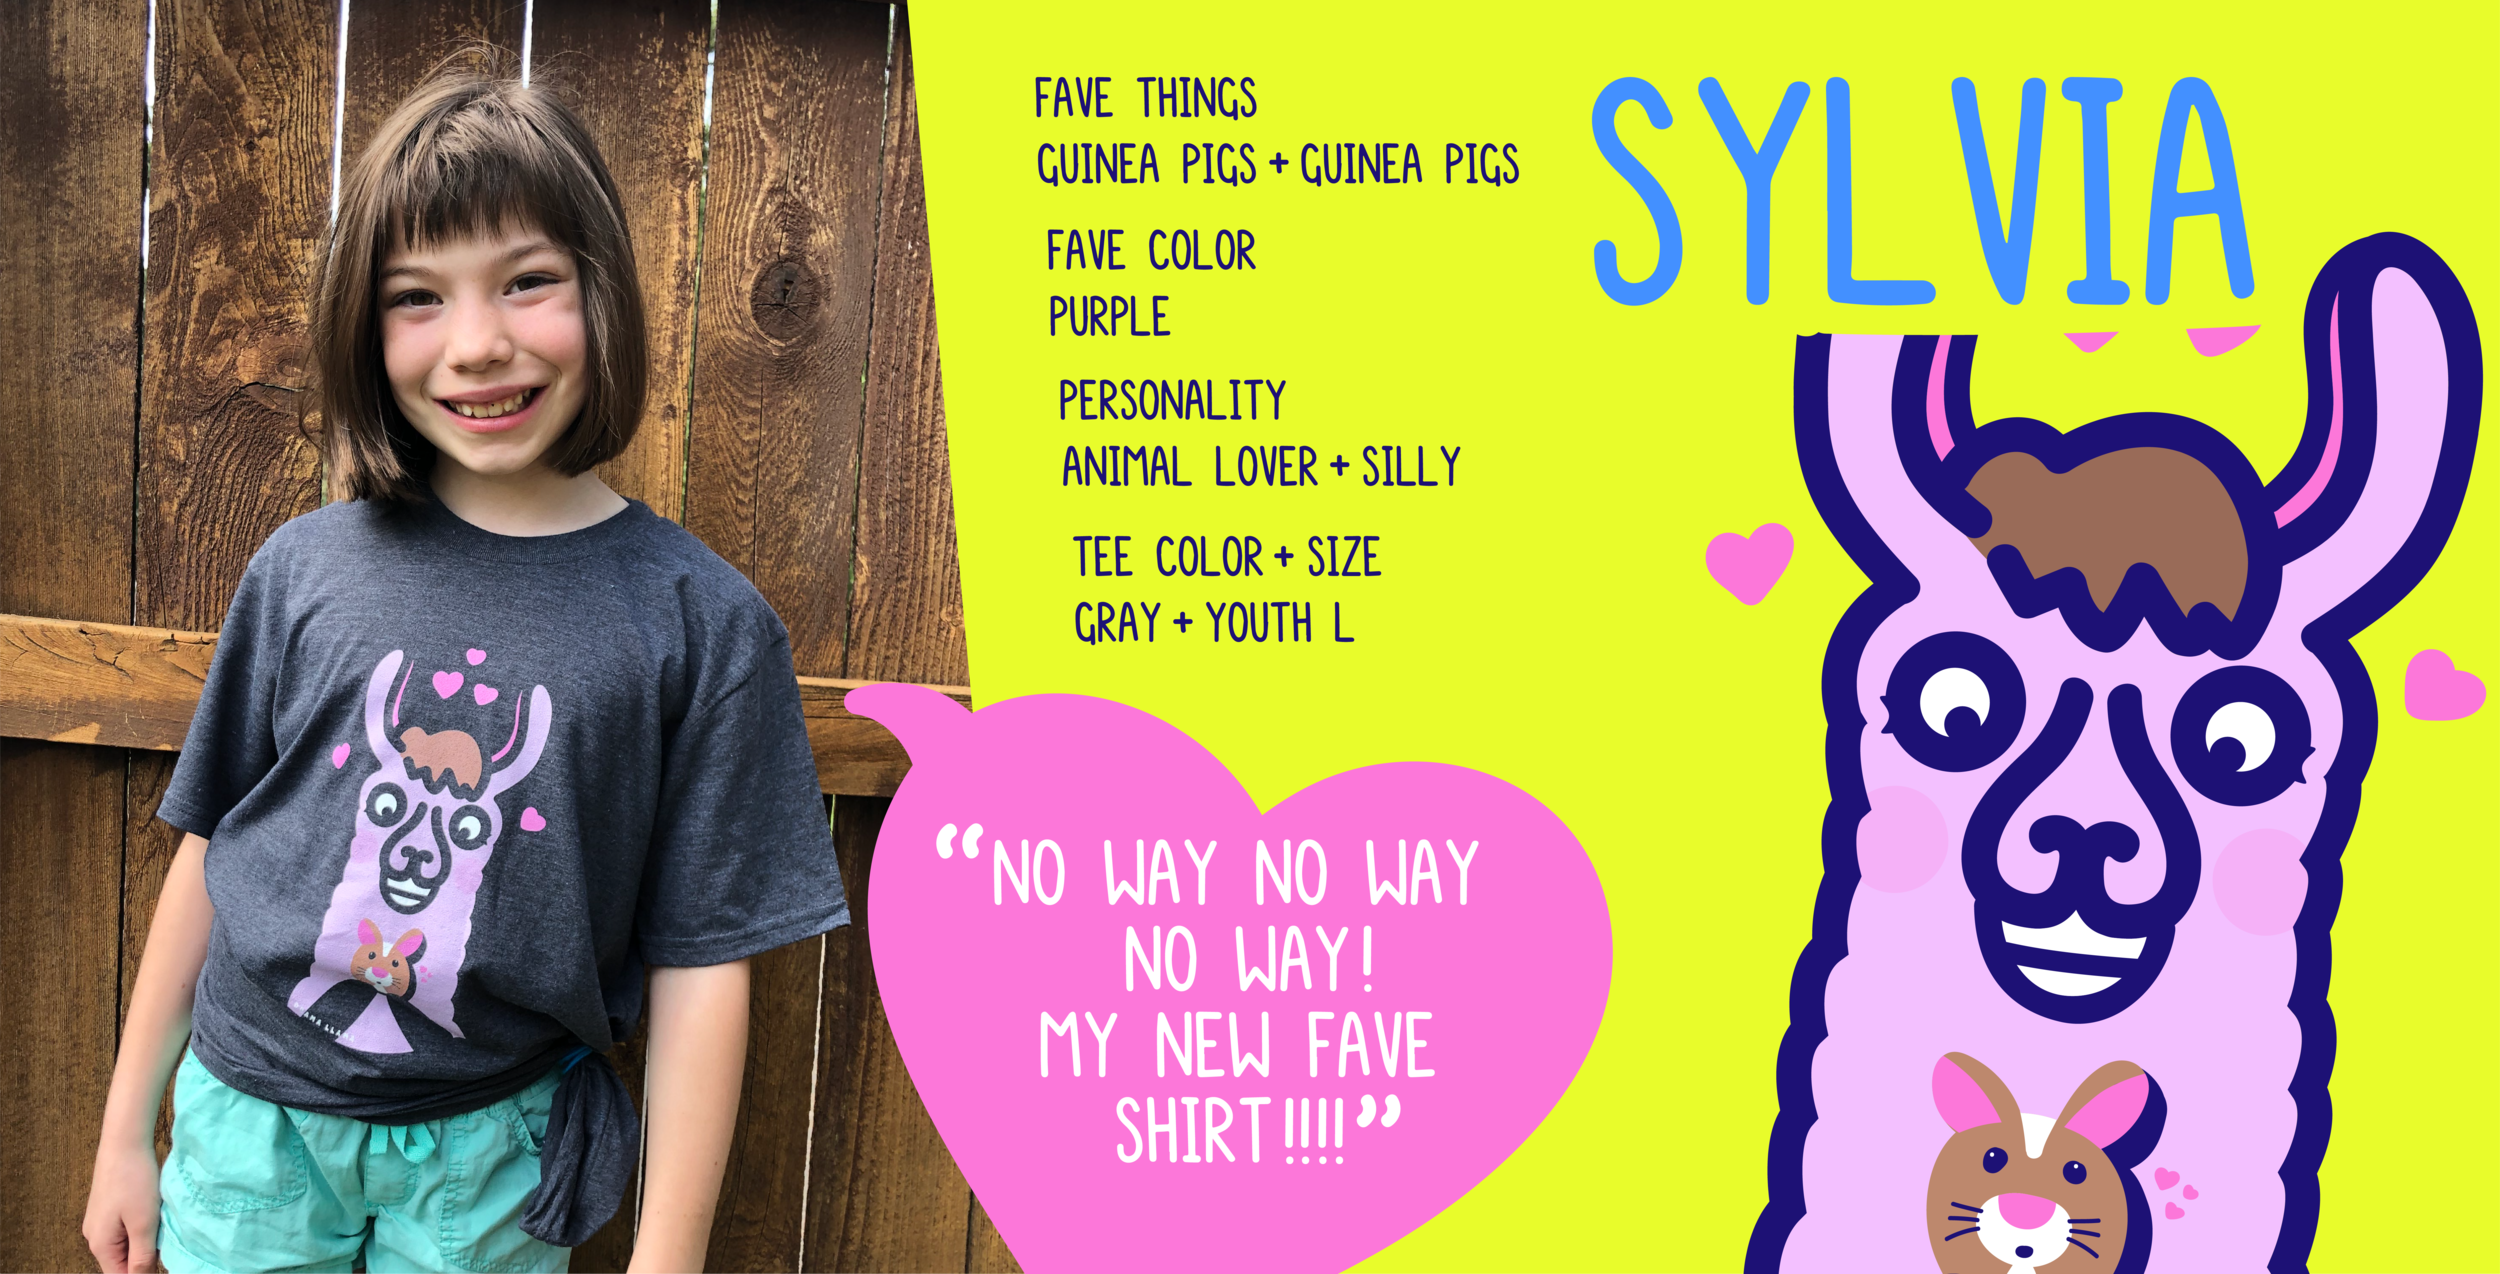 SylviaSlider-13.png